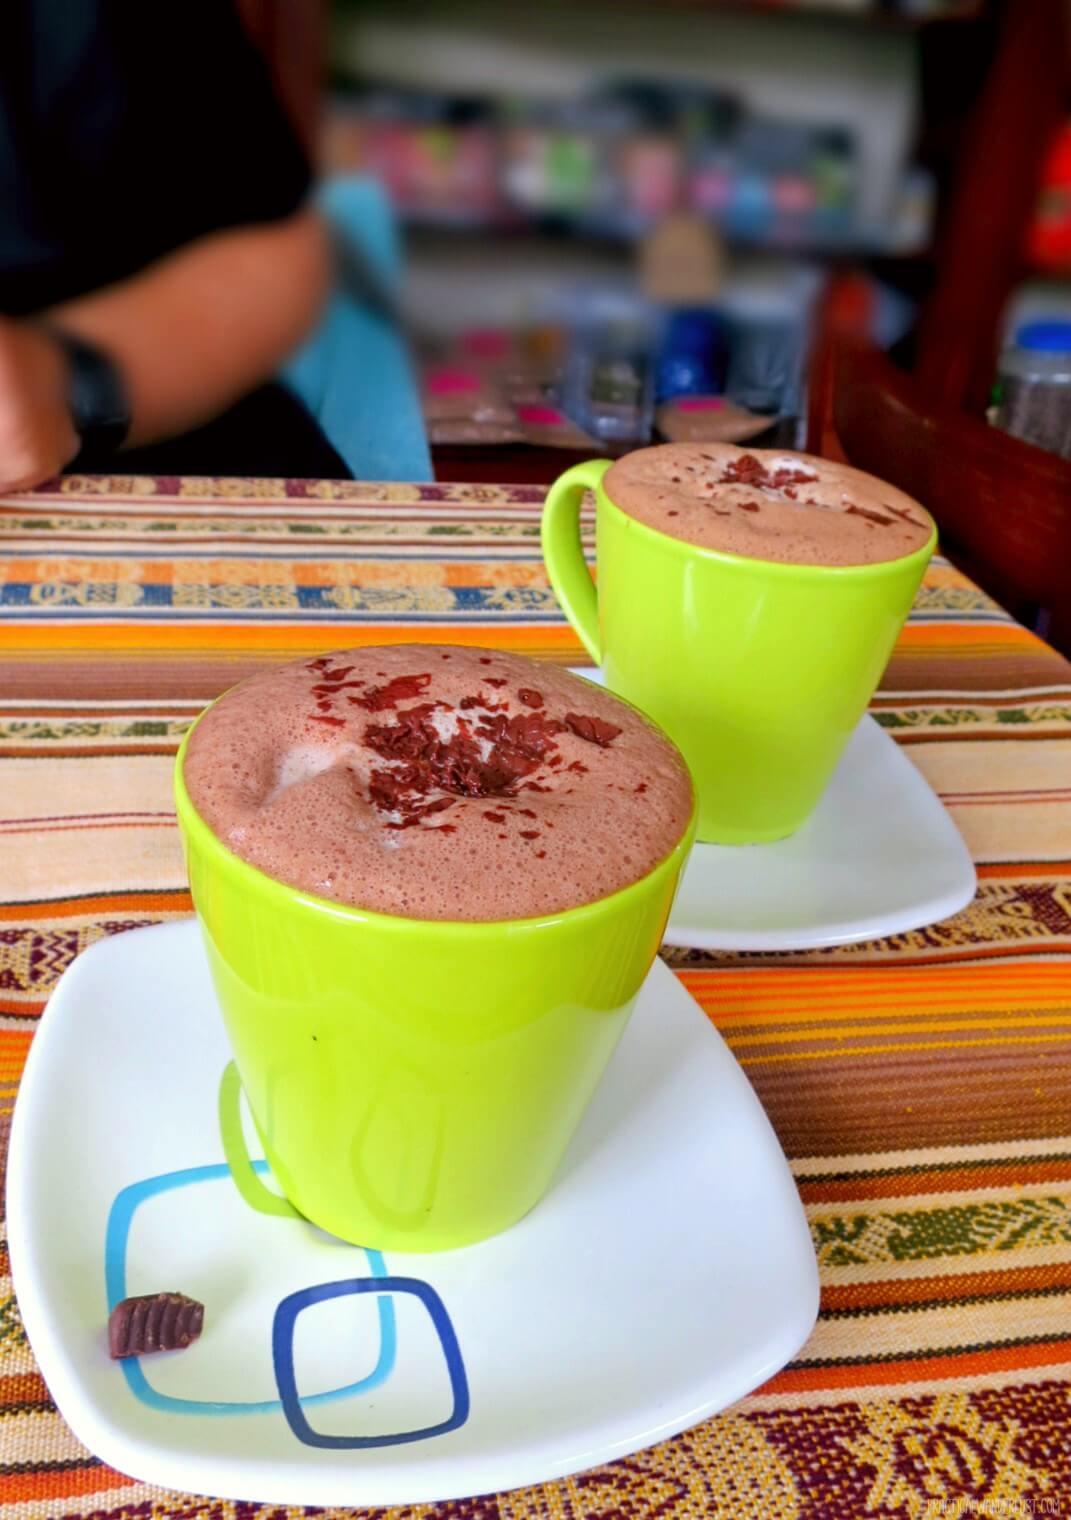 Delicious Ecuadorian hot chocolate at Amore chocolate shop in Baños, Ecuador.